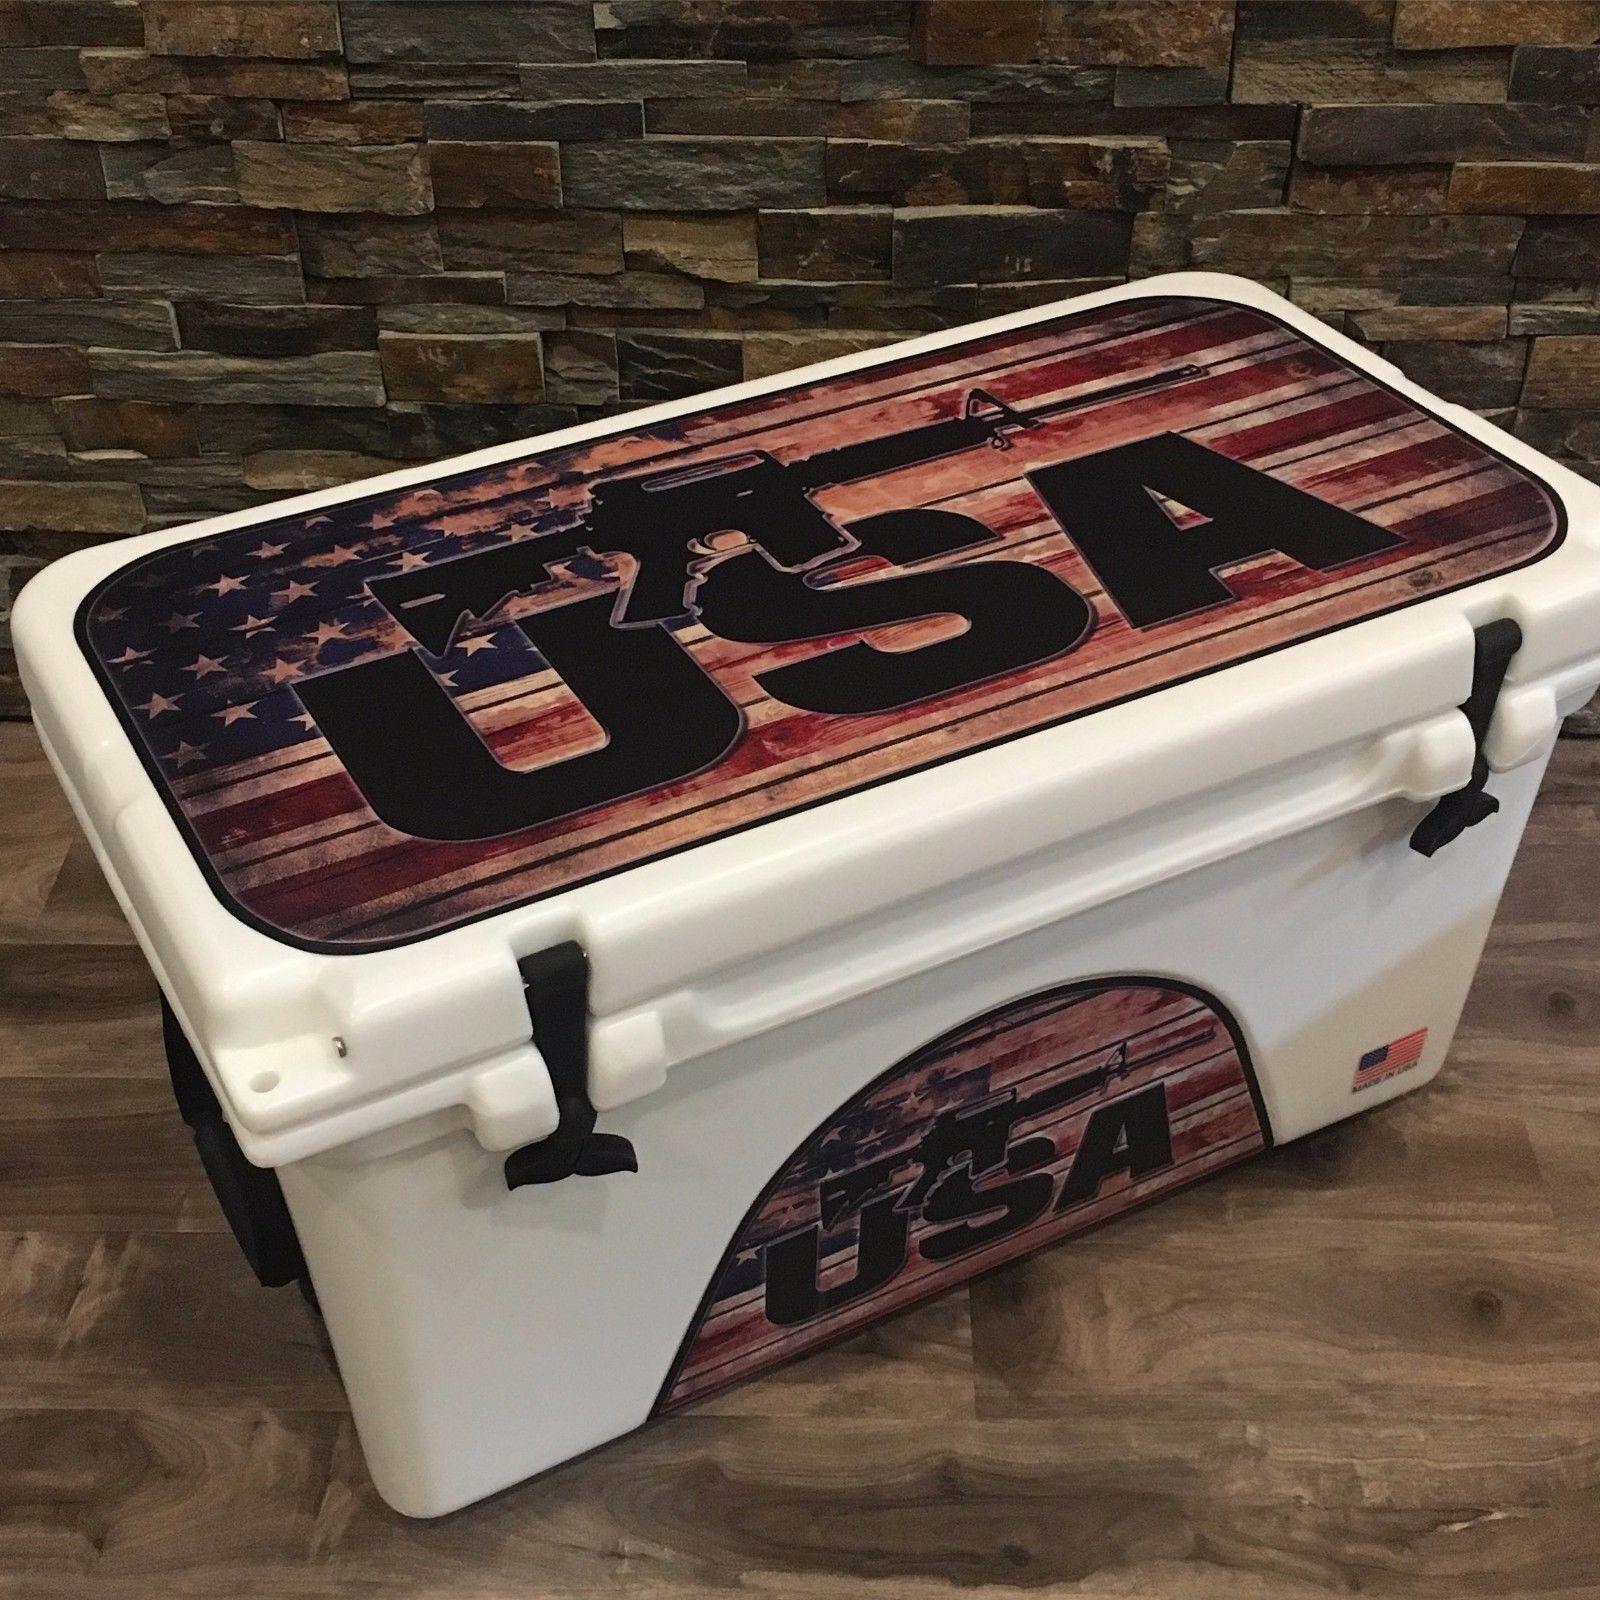 USATuff Custom Wrap Decal fits ORCA 58qt Cooler Full Niedriger USA USA Niedriger ROT Line Flag d52913